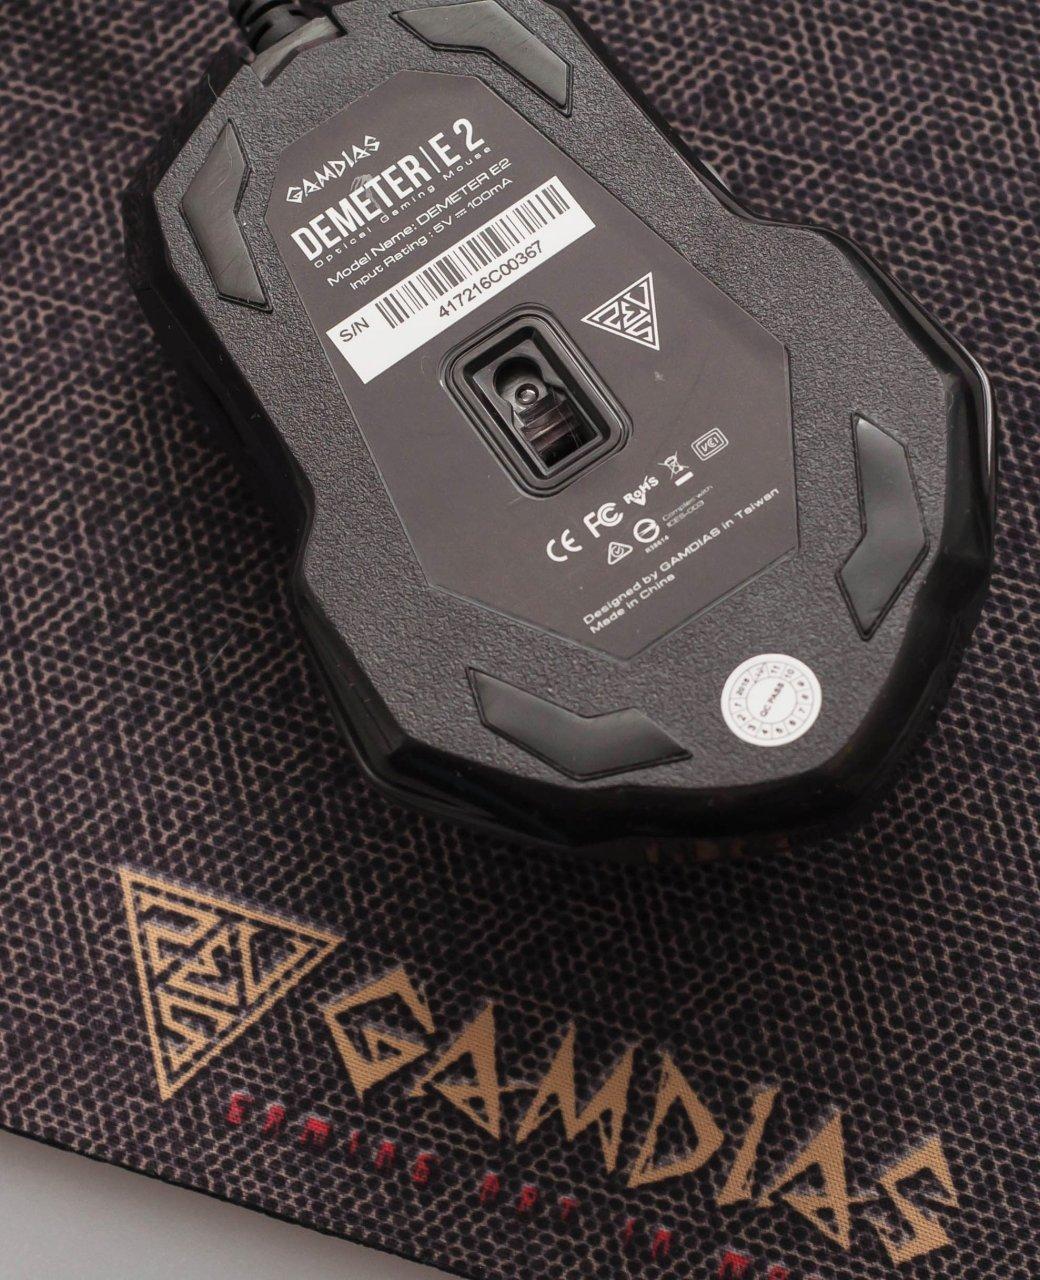 Обзор комплекта периферии Gamdias Hermes E1 Gaming Combo   Канобу - Изображение 9